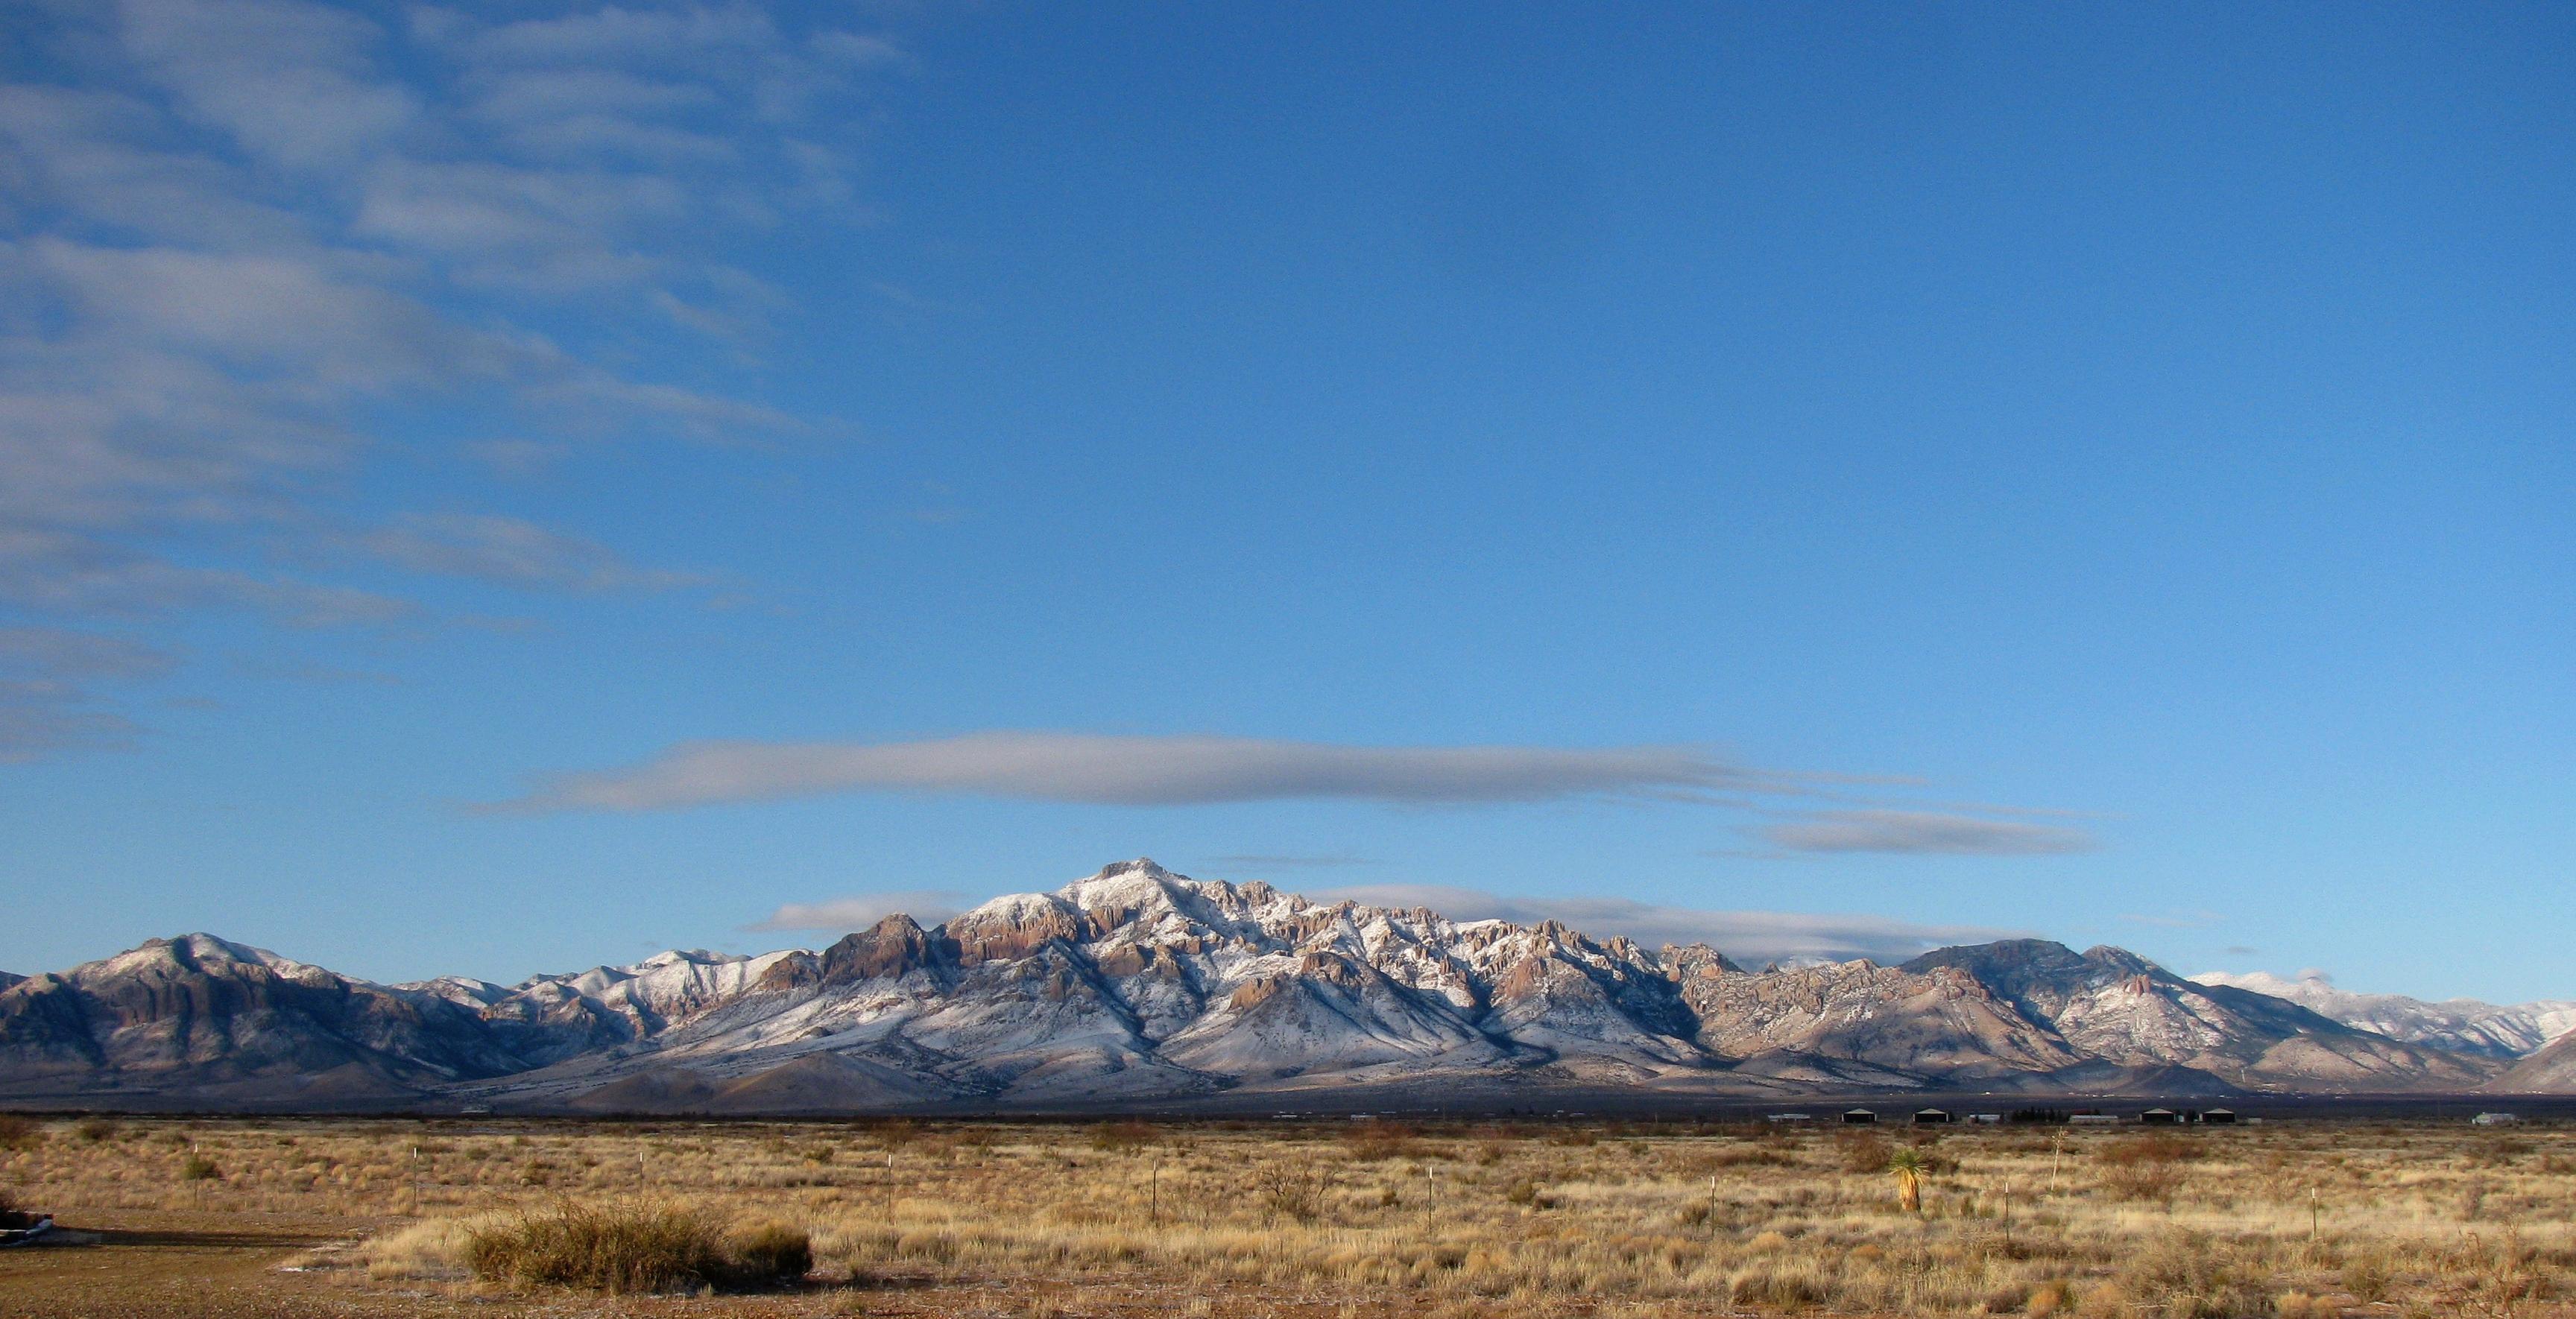 portal_peak_in_the_chiricahua_mountains